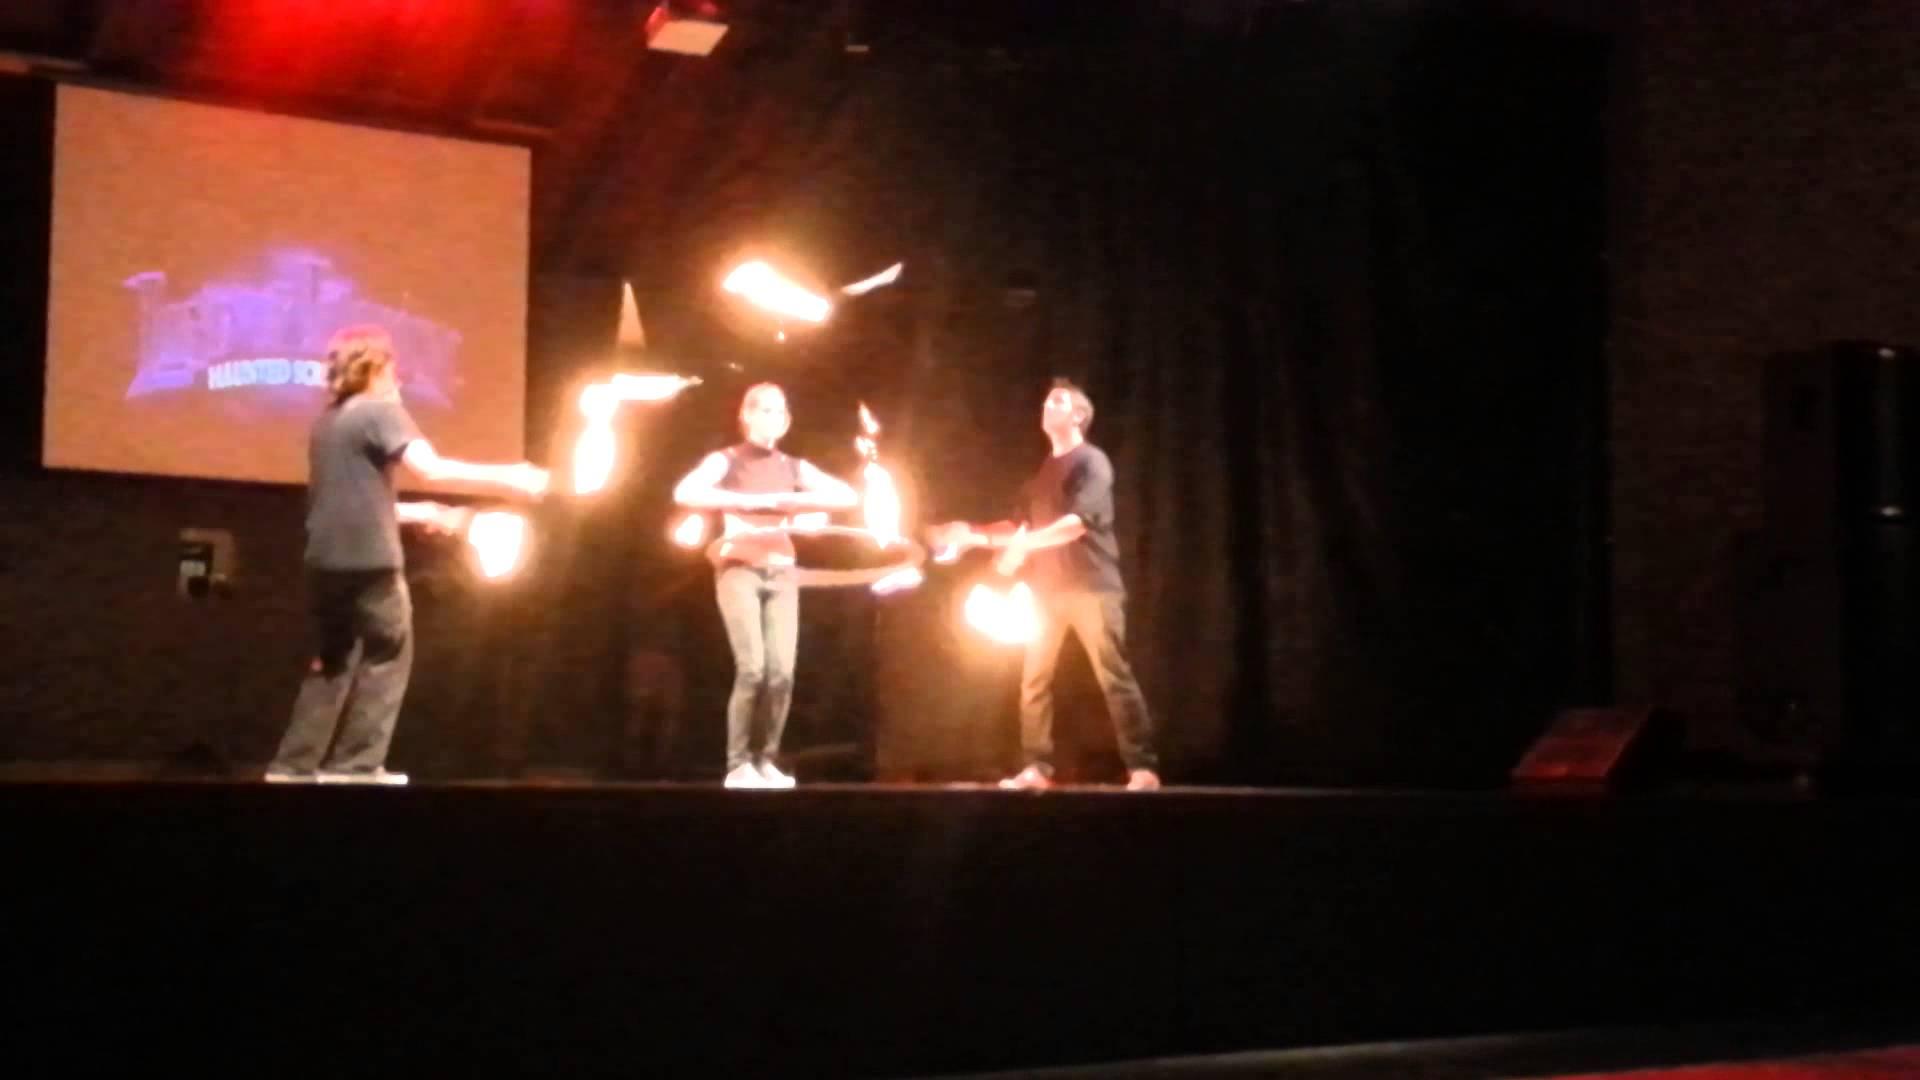 Fire_Show_Juggling_Hoop_Rob Ali Kevin